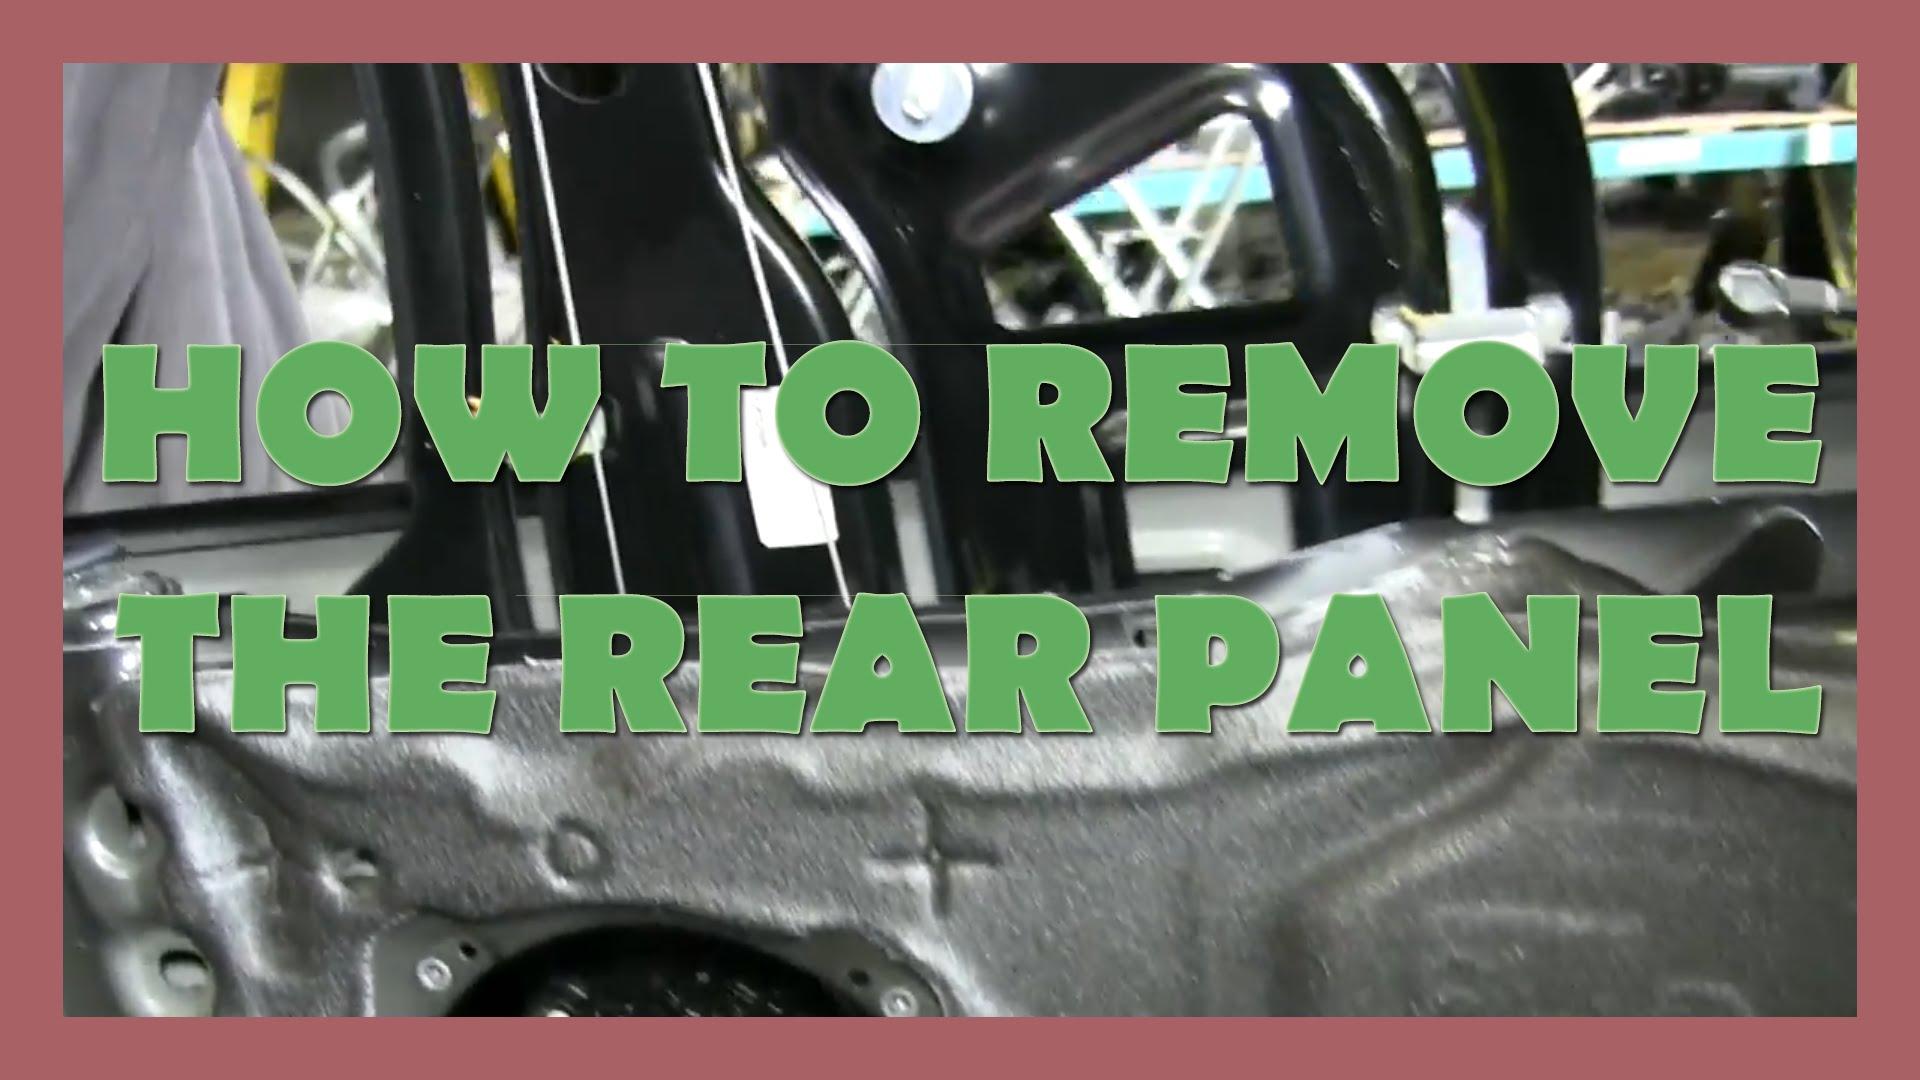 audi cabriolet window regulator replacement